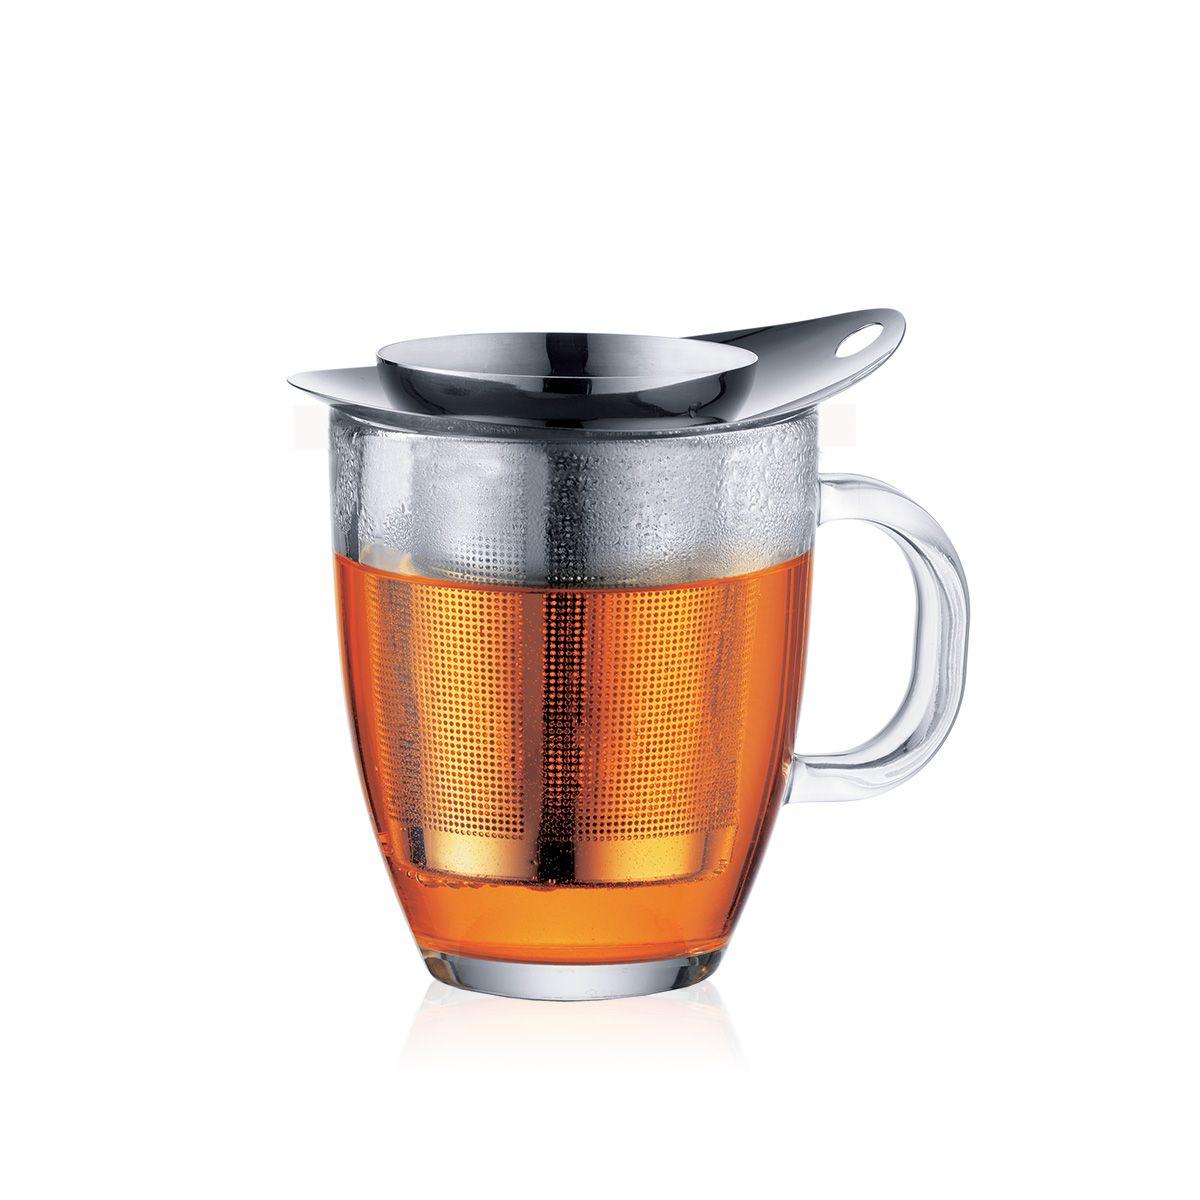 tea mug with infuser - Bodum